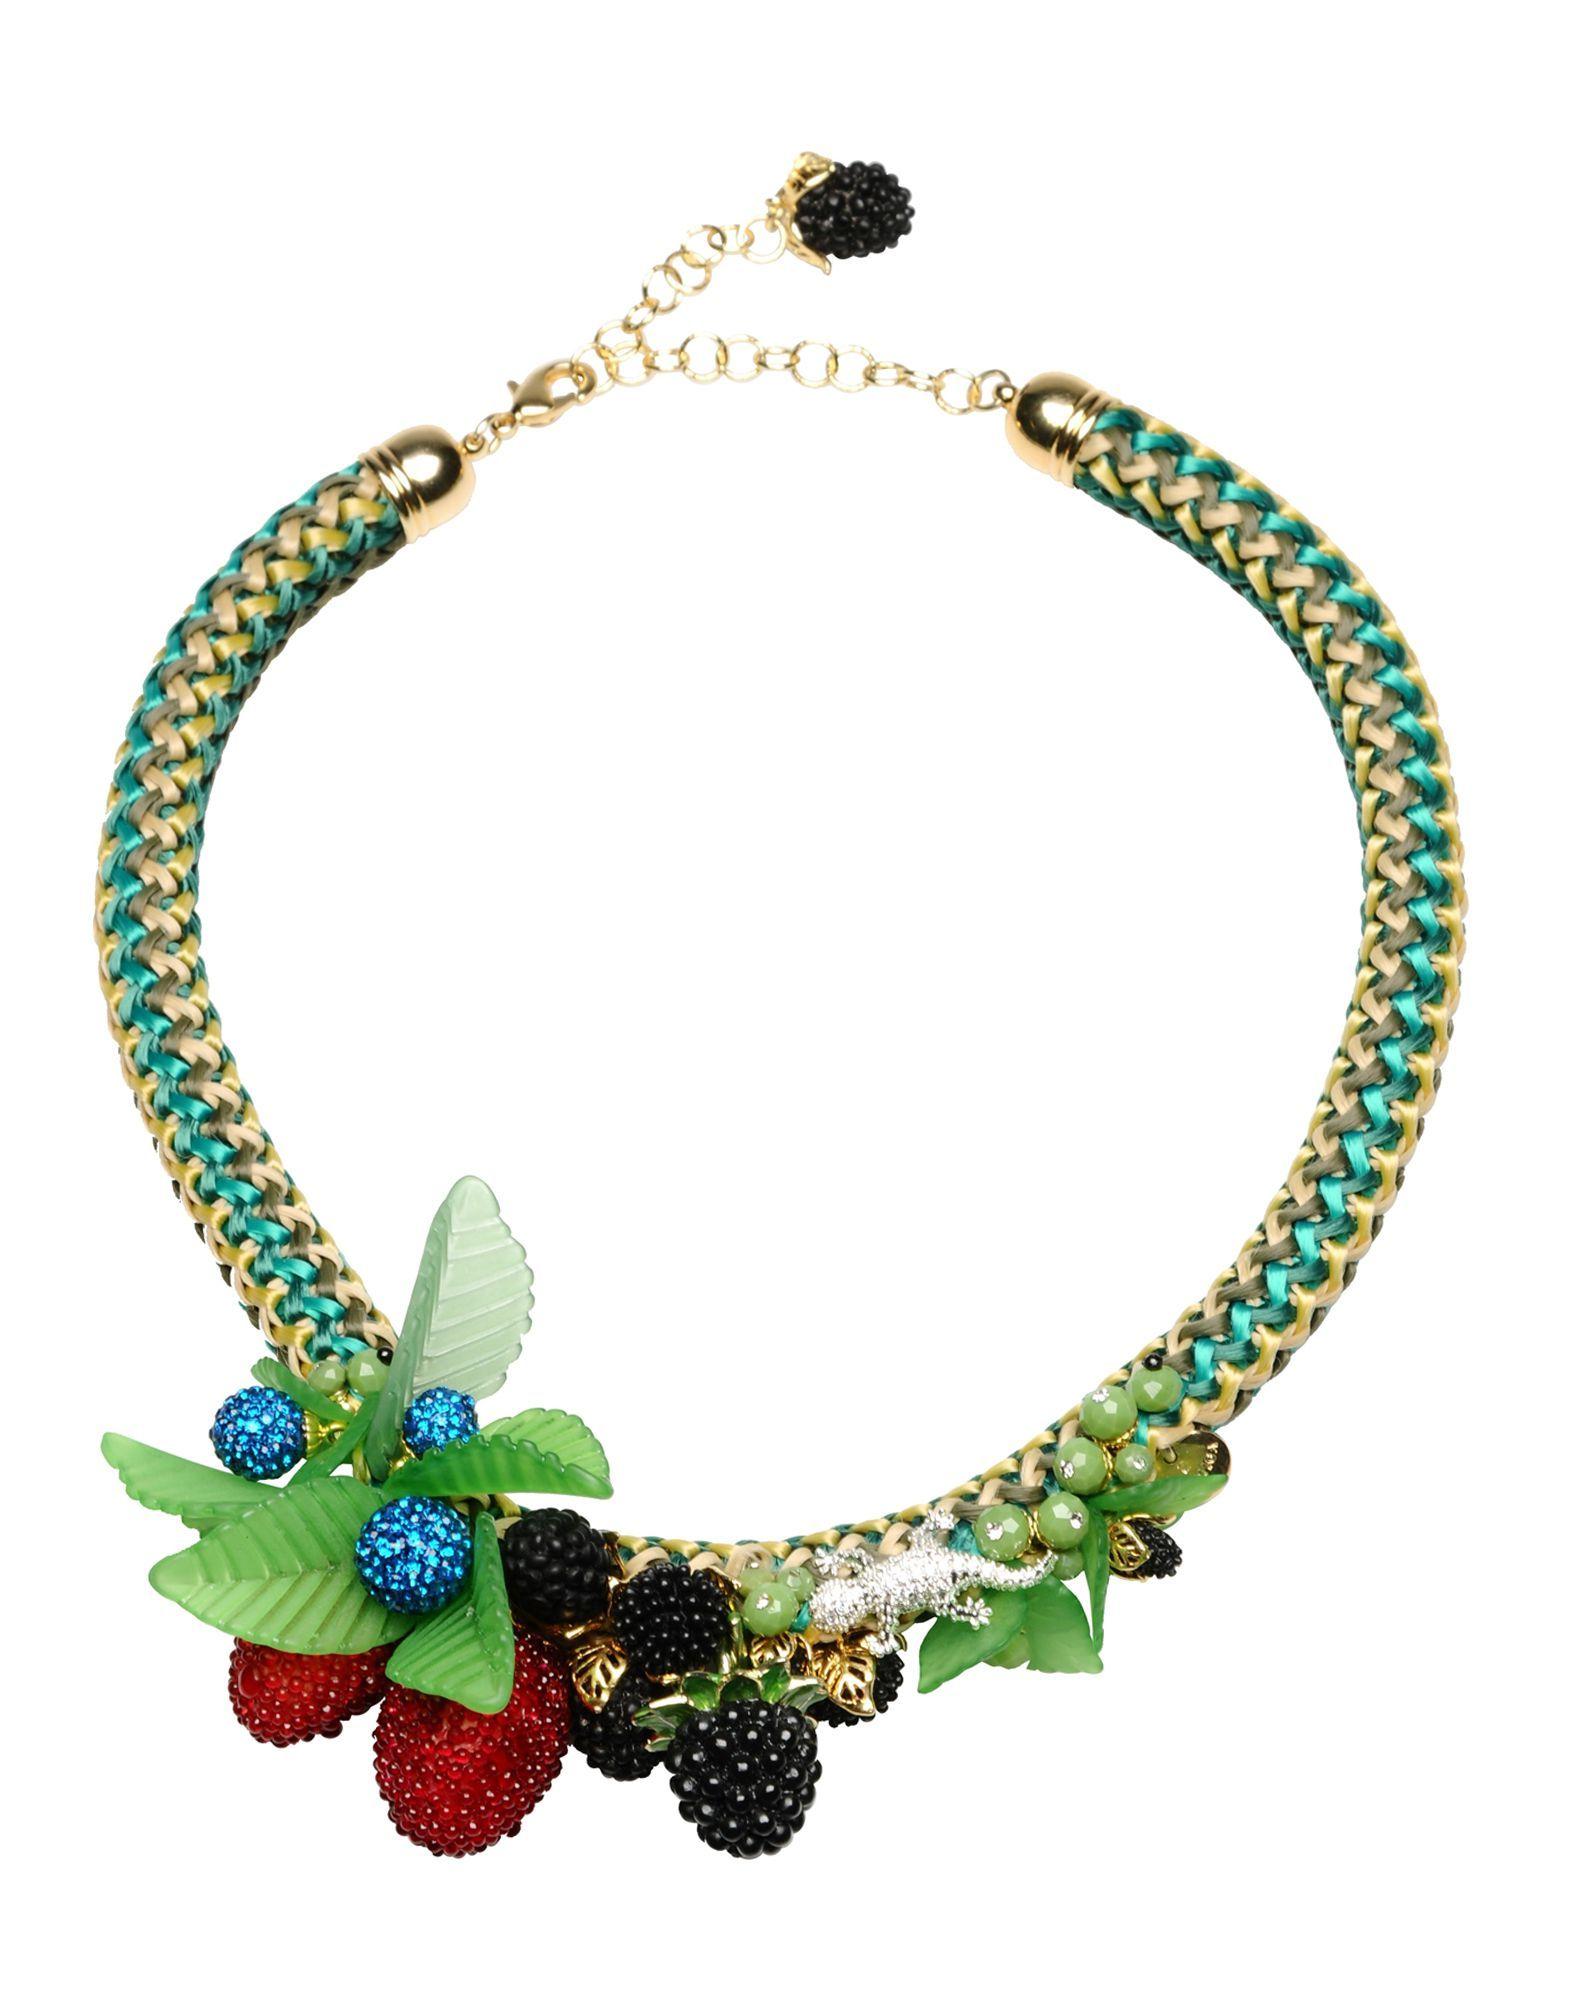 LA HORMIGA JEWELRY - Bracelets su YOOX.COM u1BFj2n